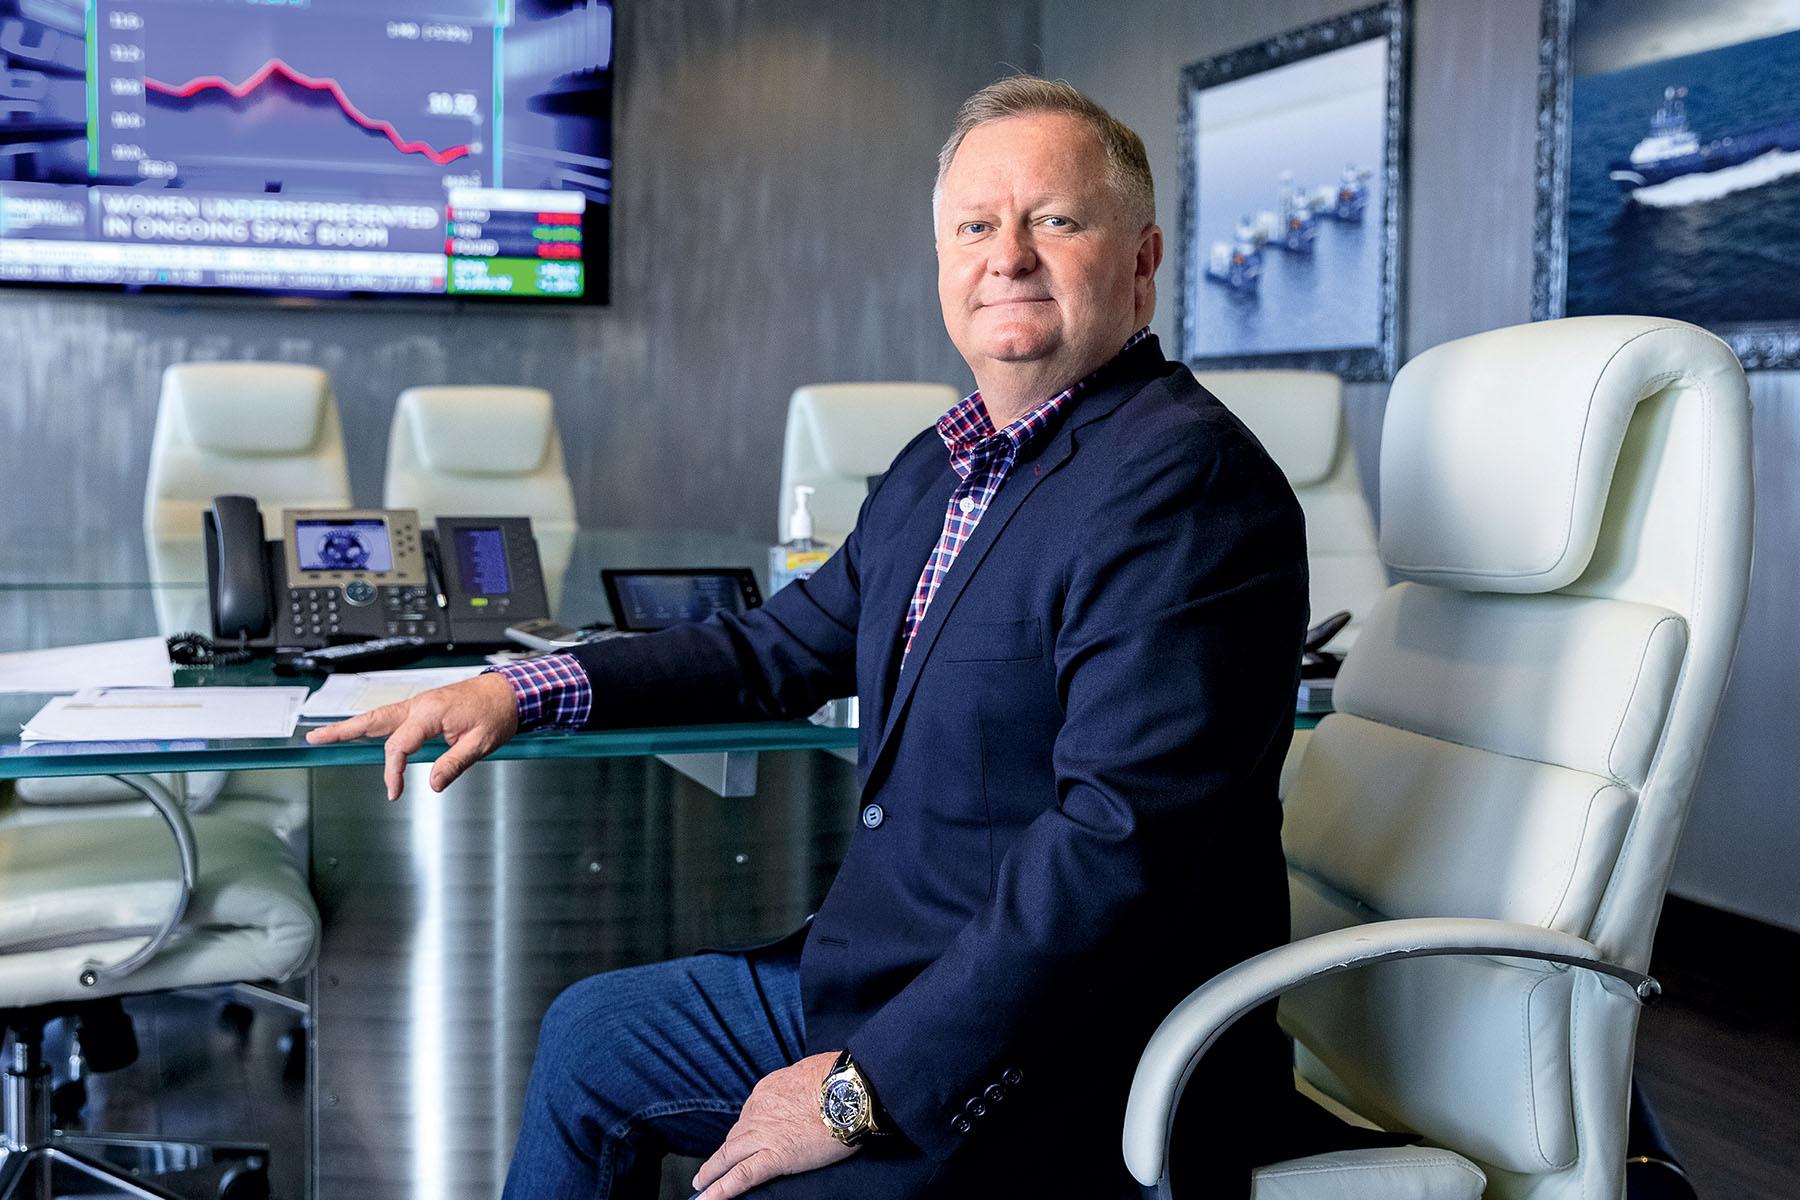 Shane Guidry, Chair and CEO of Harvey Gulf International Marine